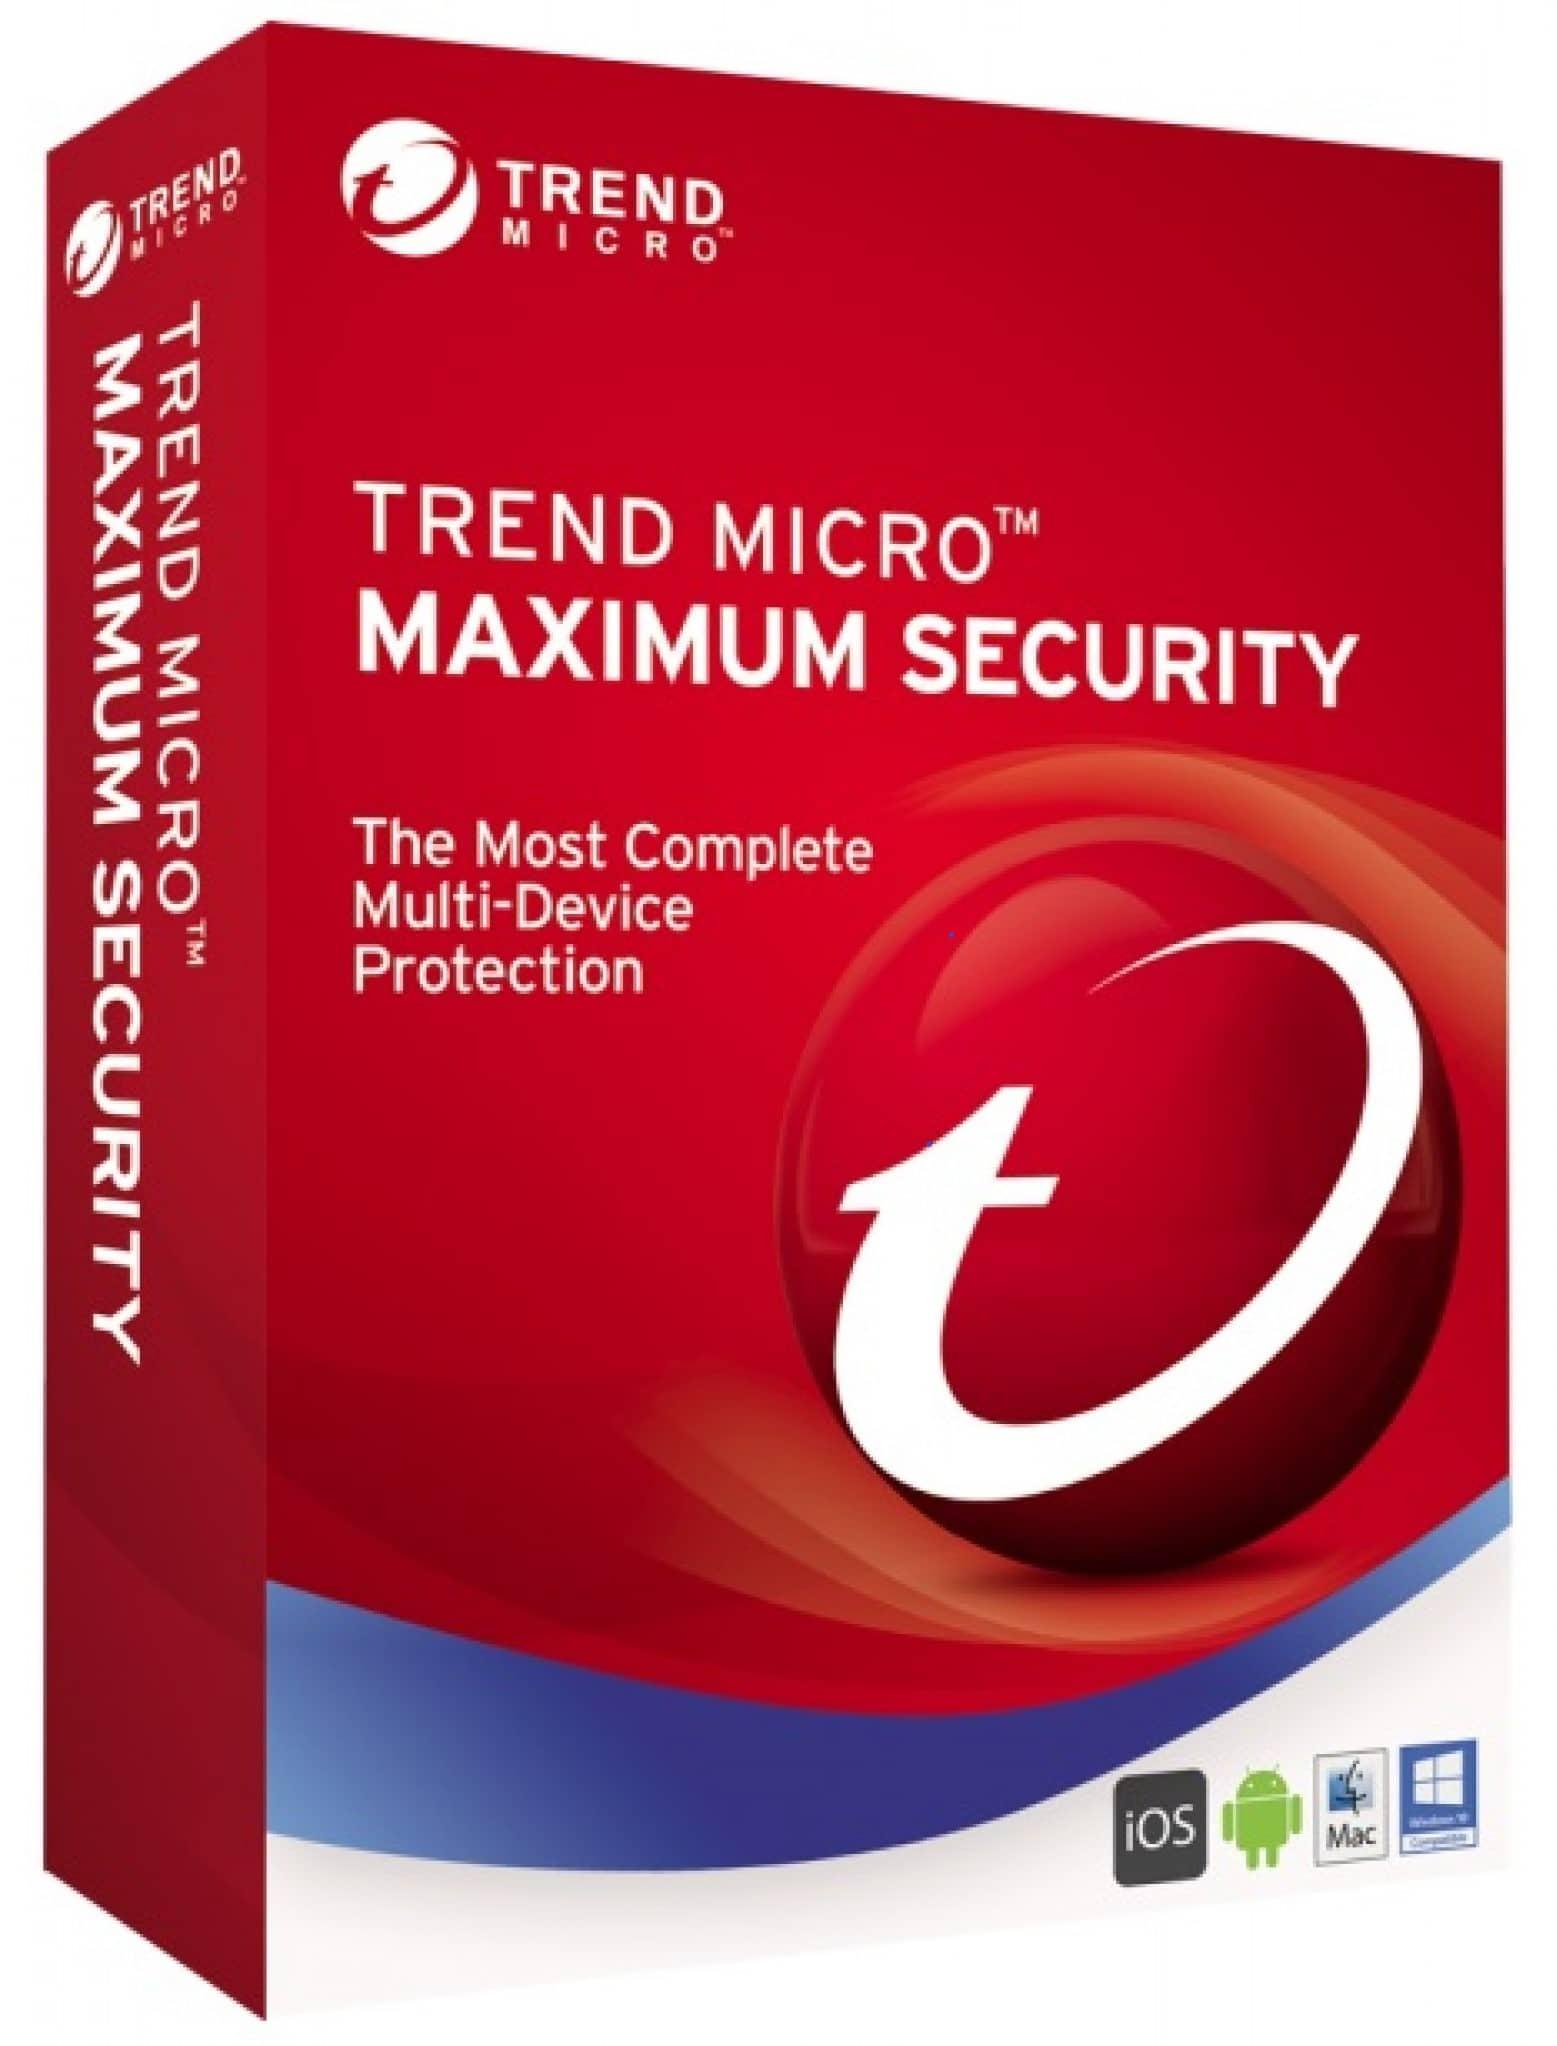 TM protection option